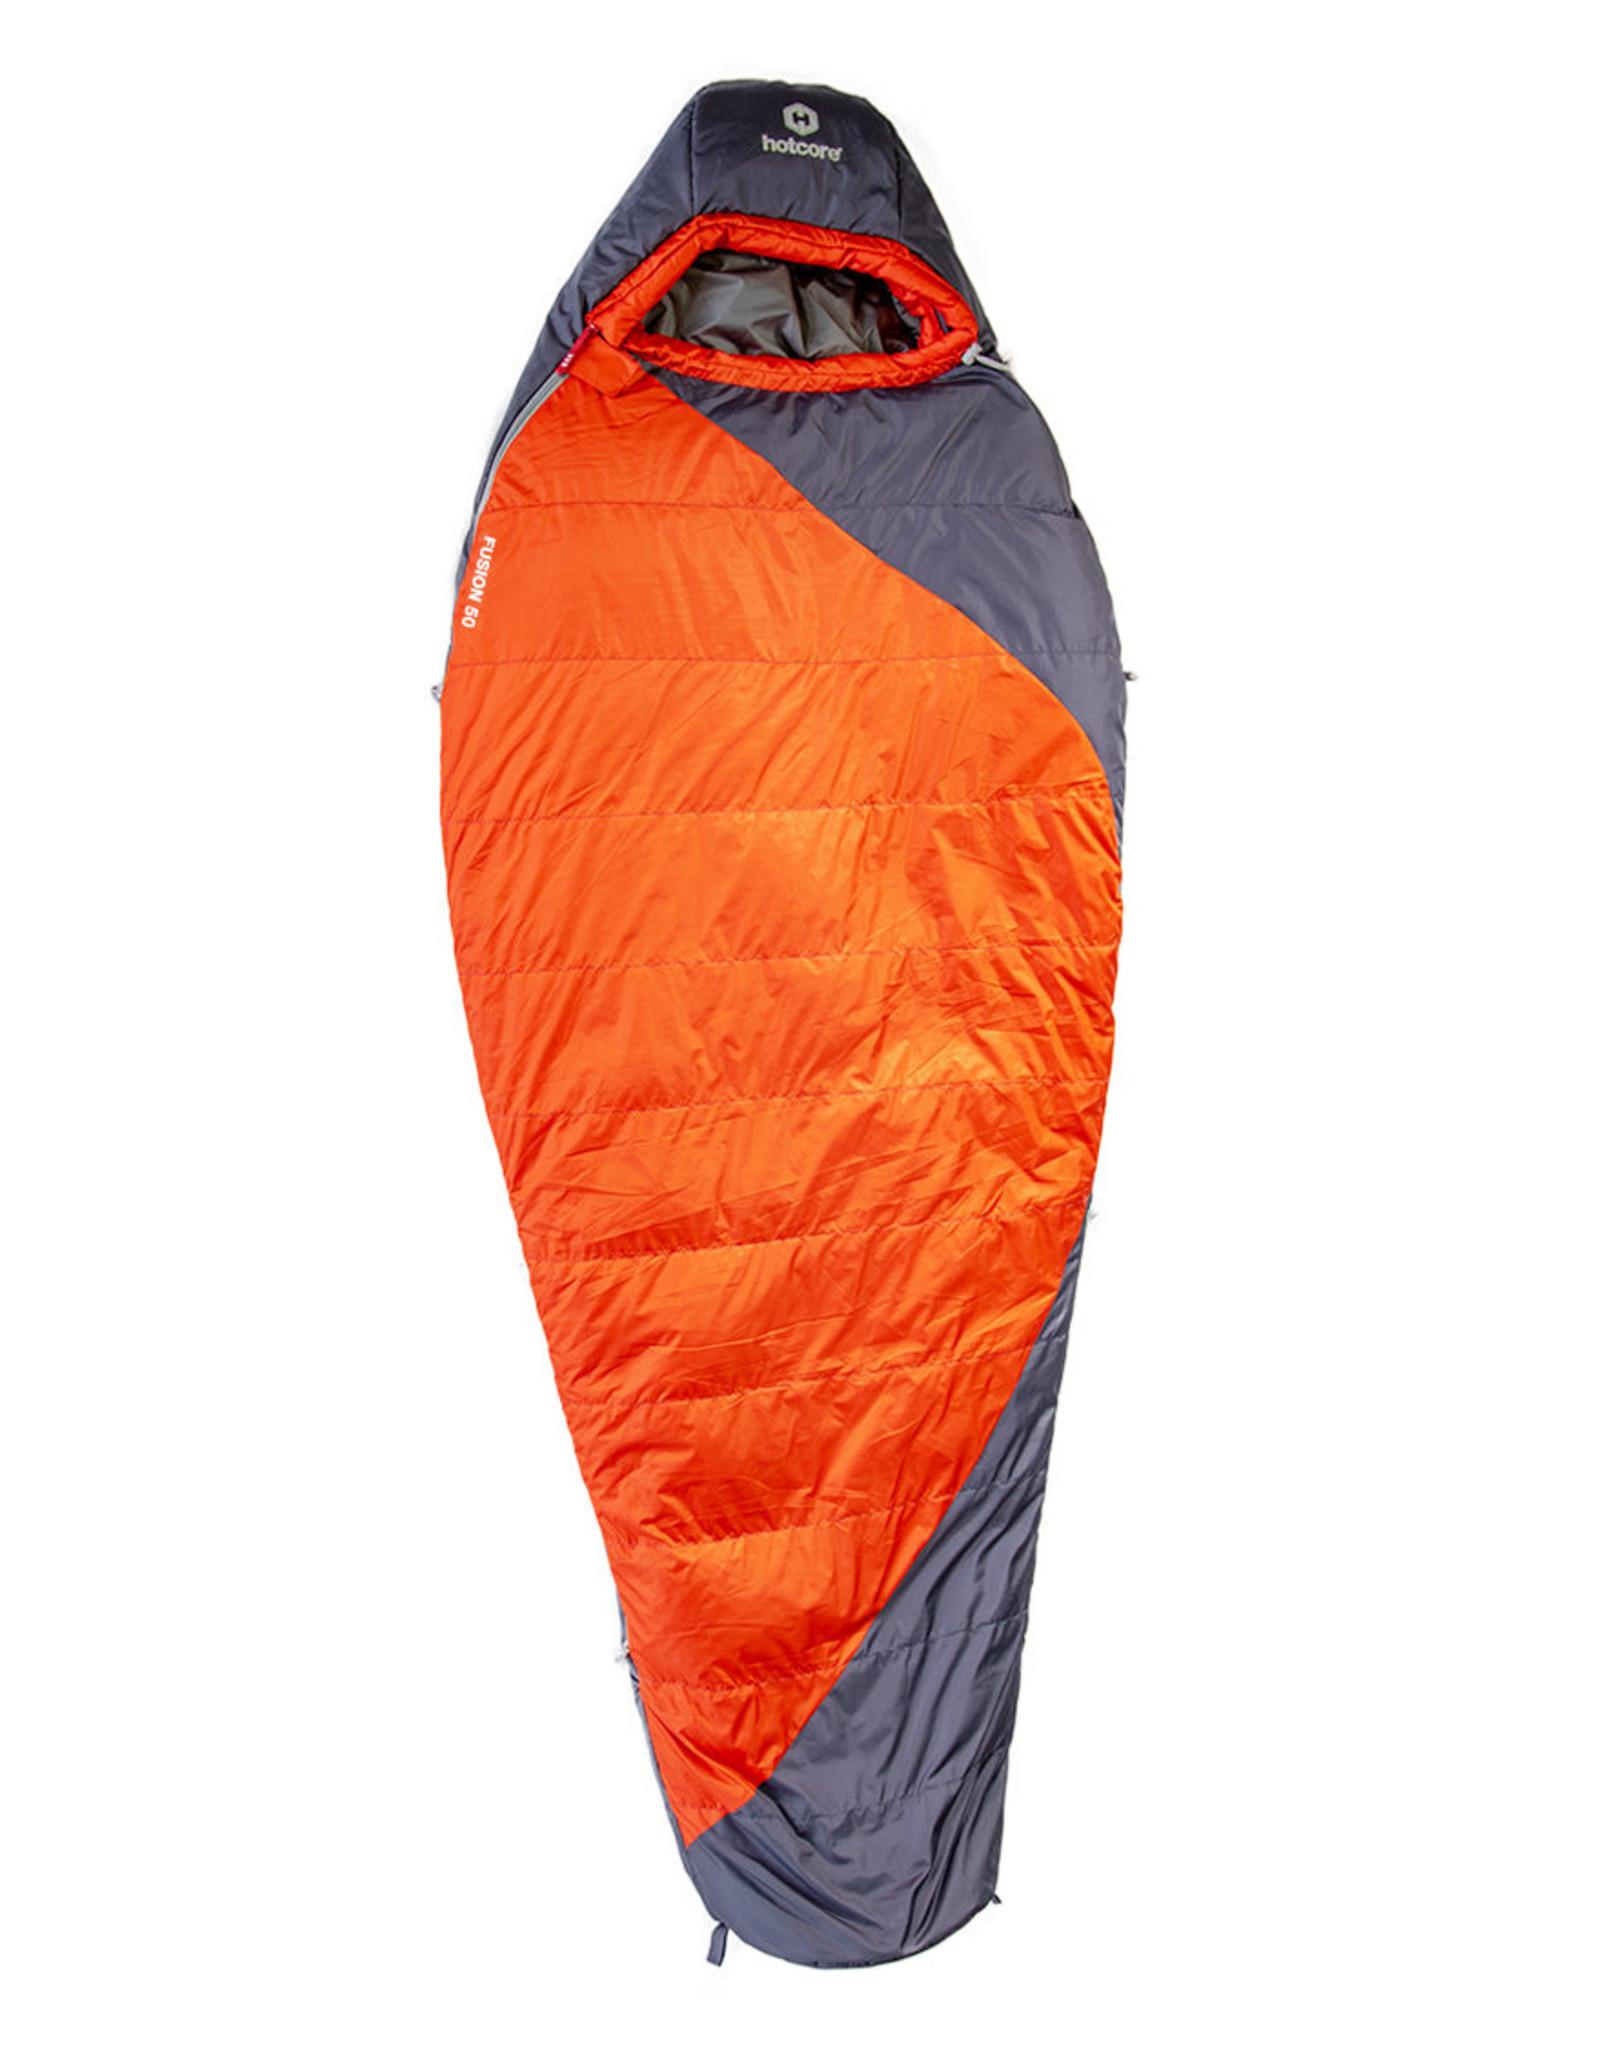 HOTCORE FUSION 50 SLEEPING BAG